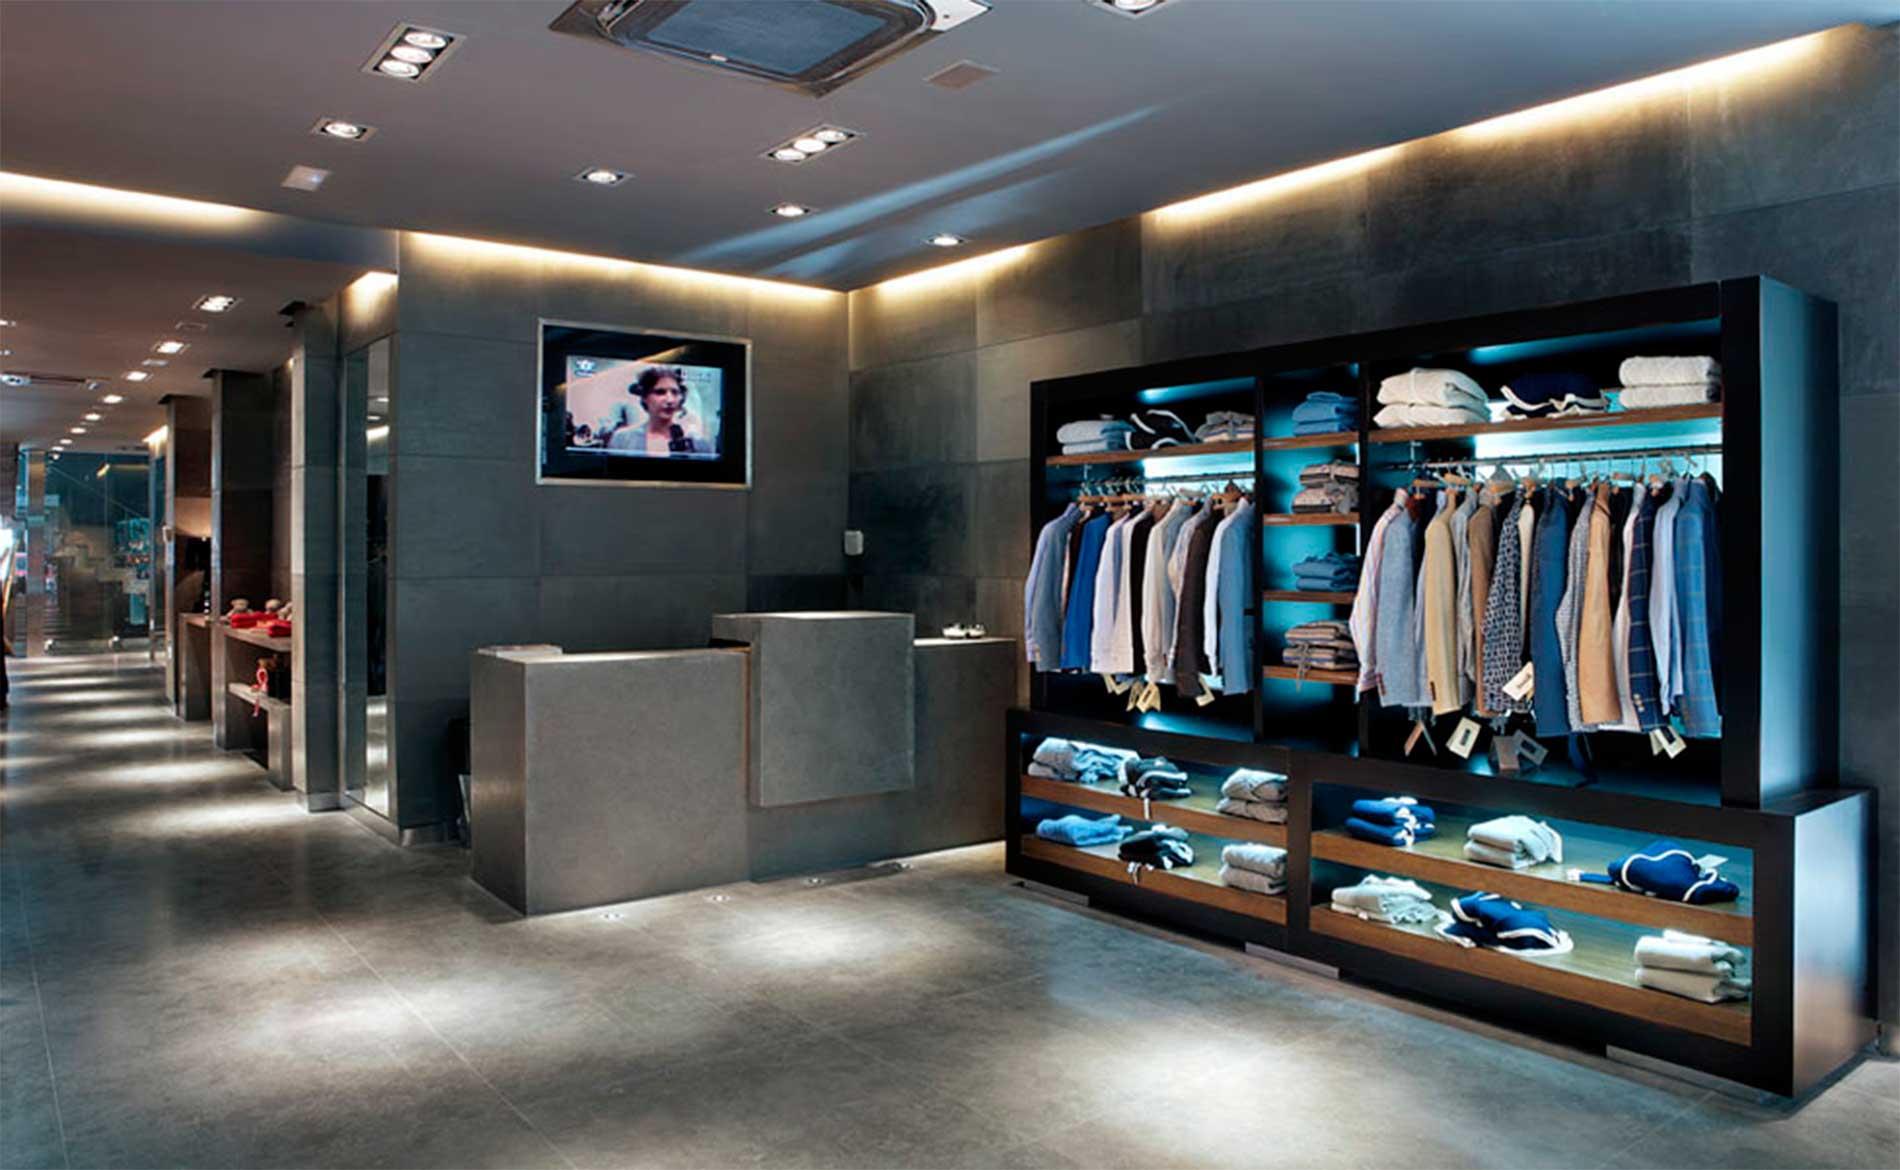 muebles tienda ropa segunda mano obtenga ideas dise o de